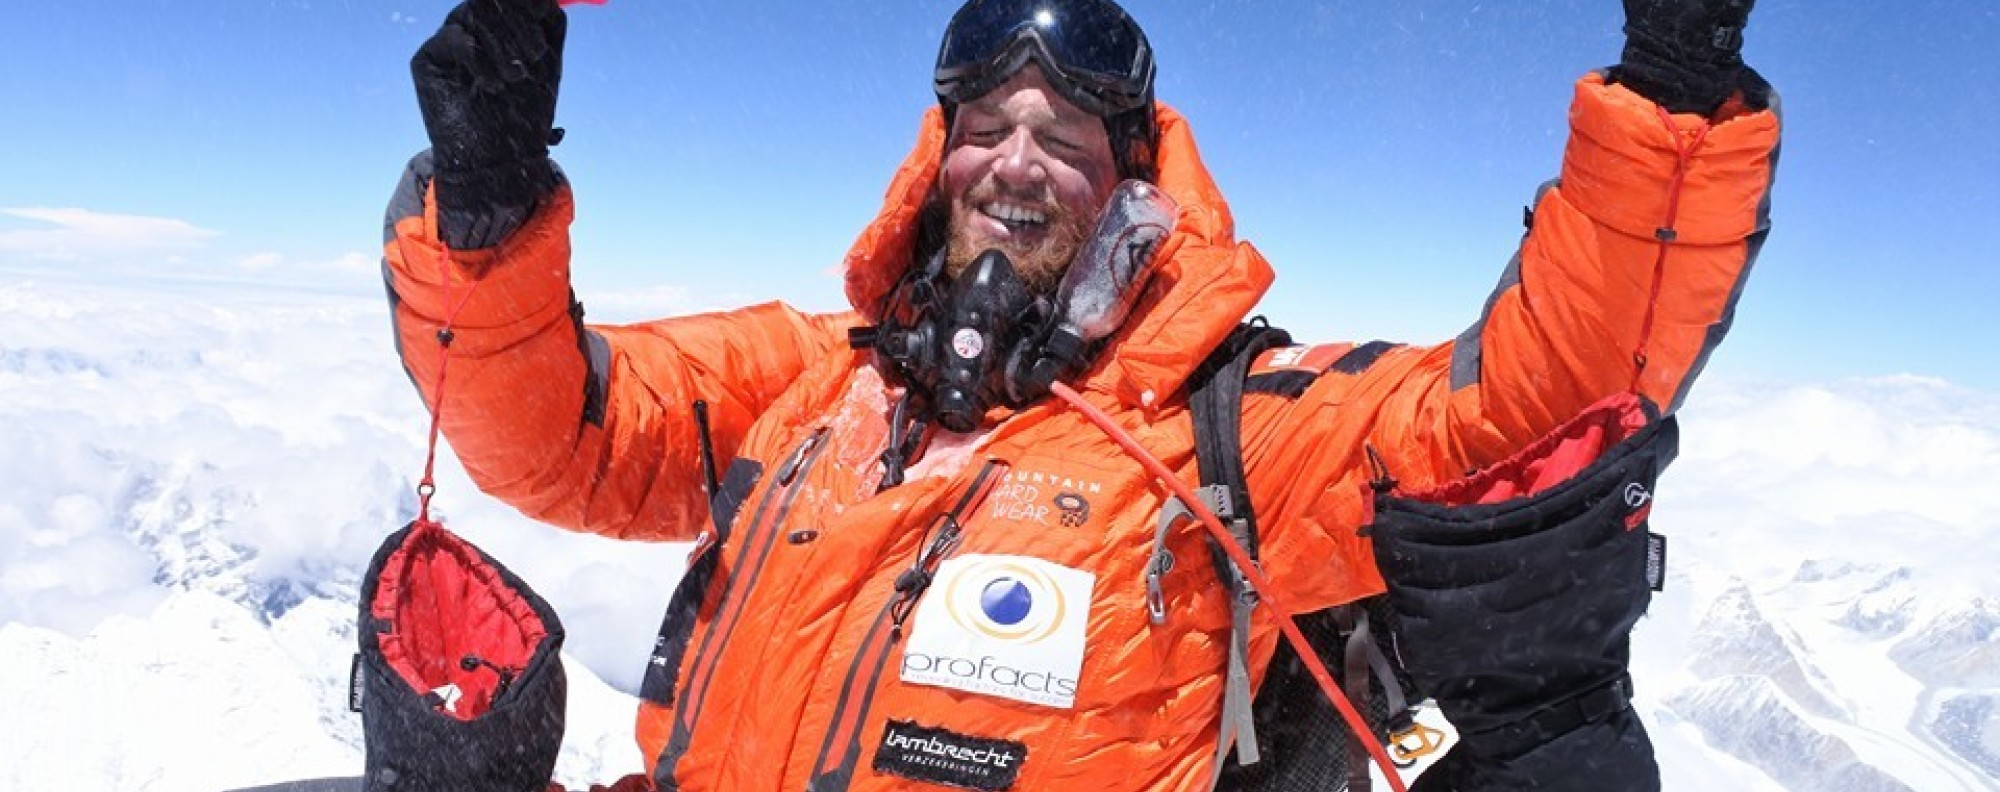 Jelle Veyt on the summit of Everest – the second peak of his seven summit challenge. Photos: Handout